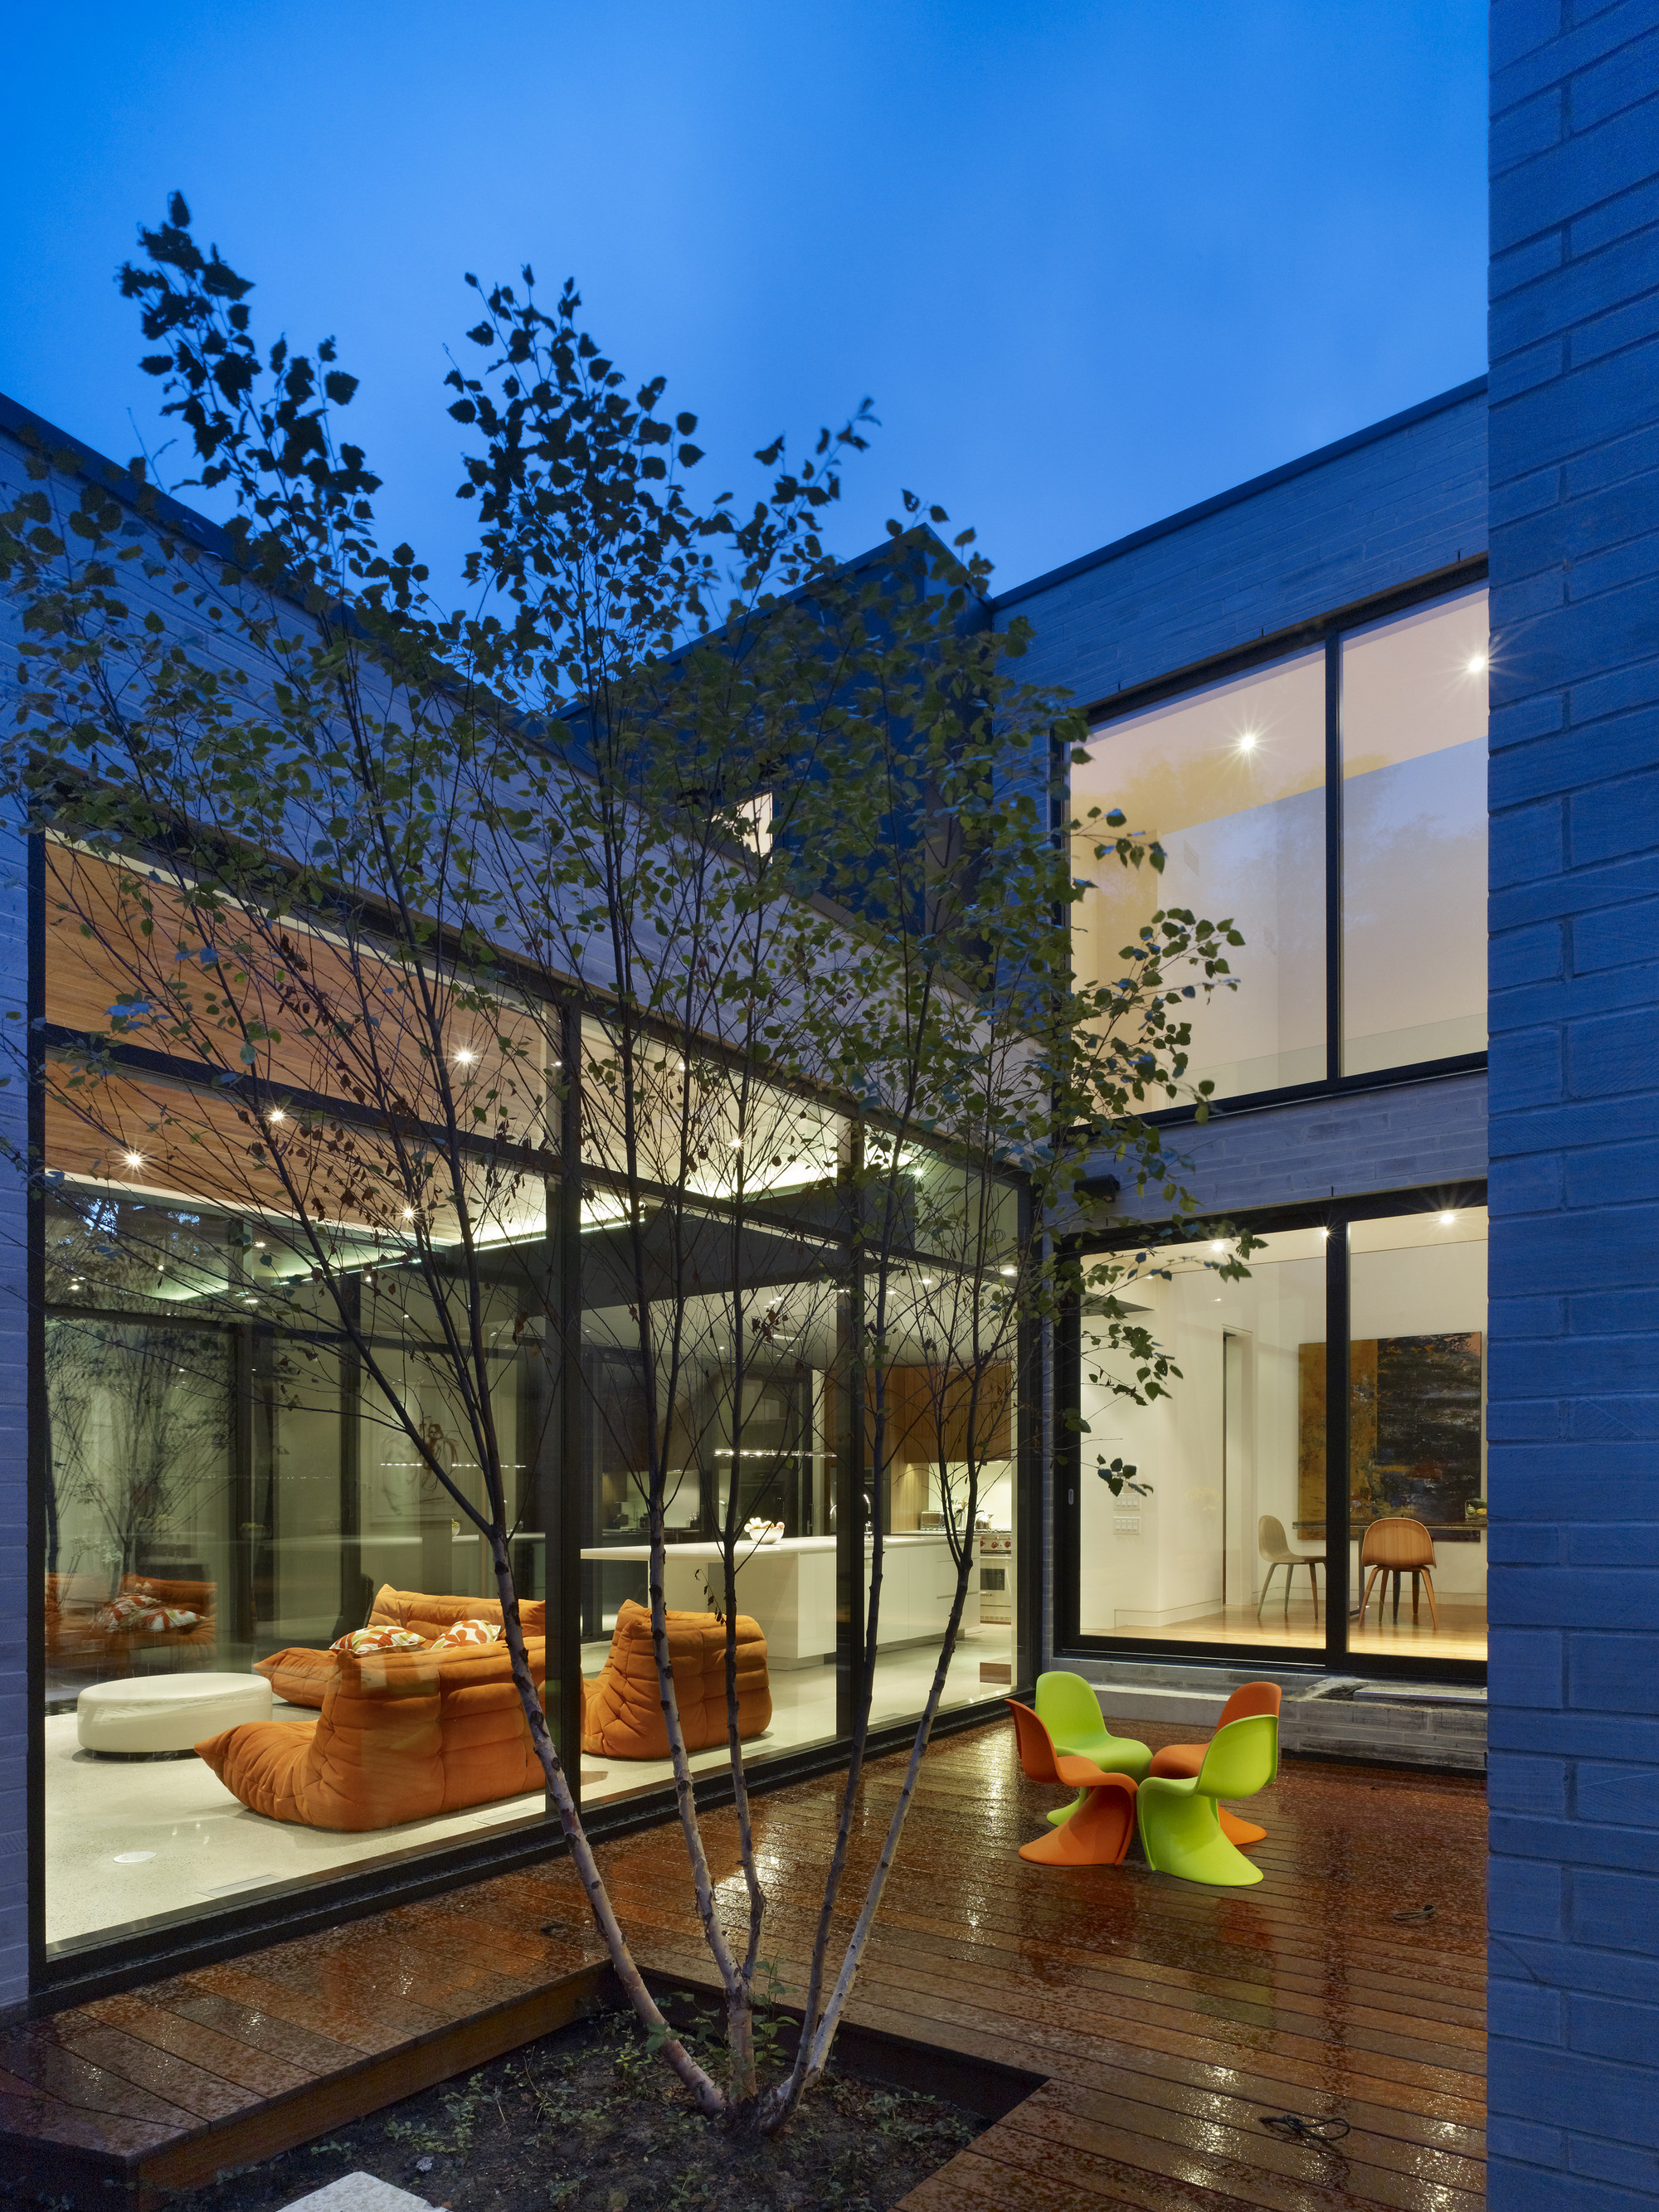 Cedarvale Ravine House By Drew Mandel Architects In